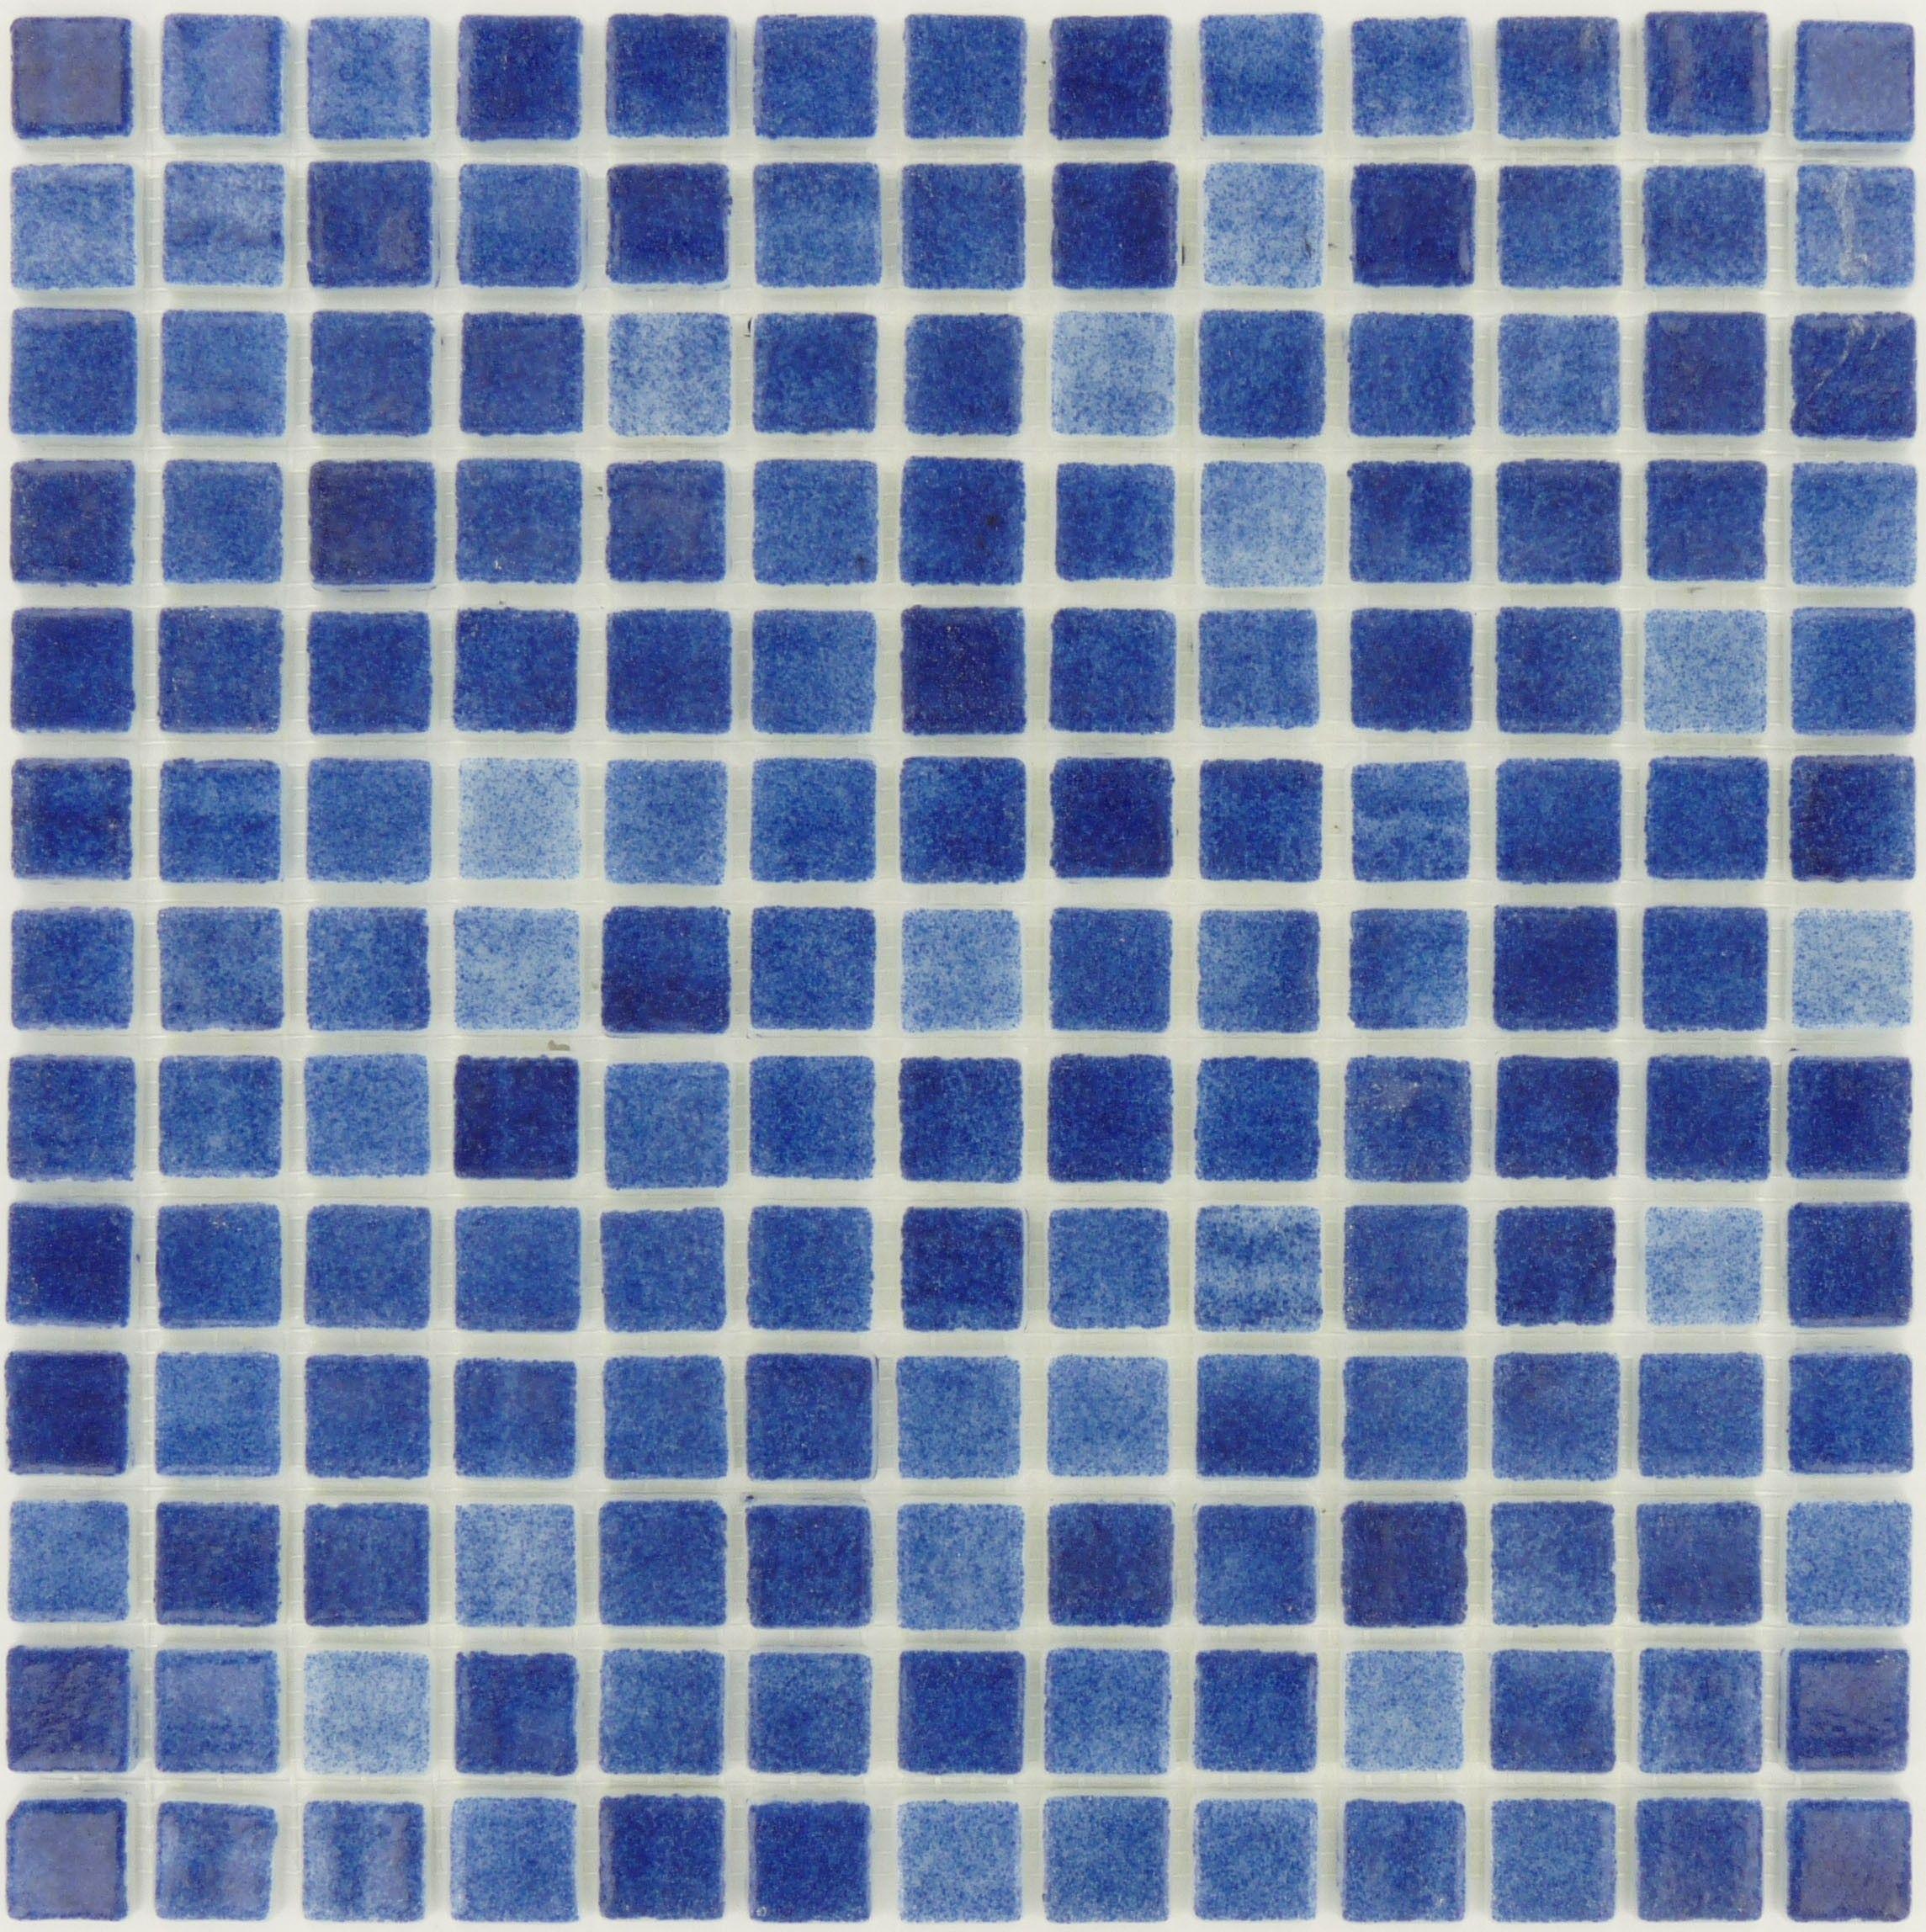 Azul Anti Slip Blue 7/8\'\' x 7/8\'\' Glass Matte Tile   Bathroom ...